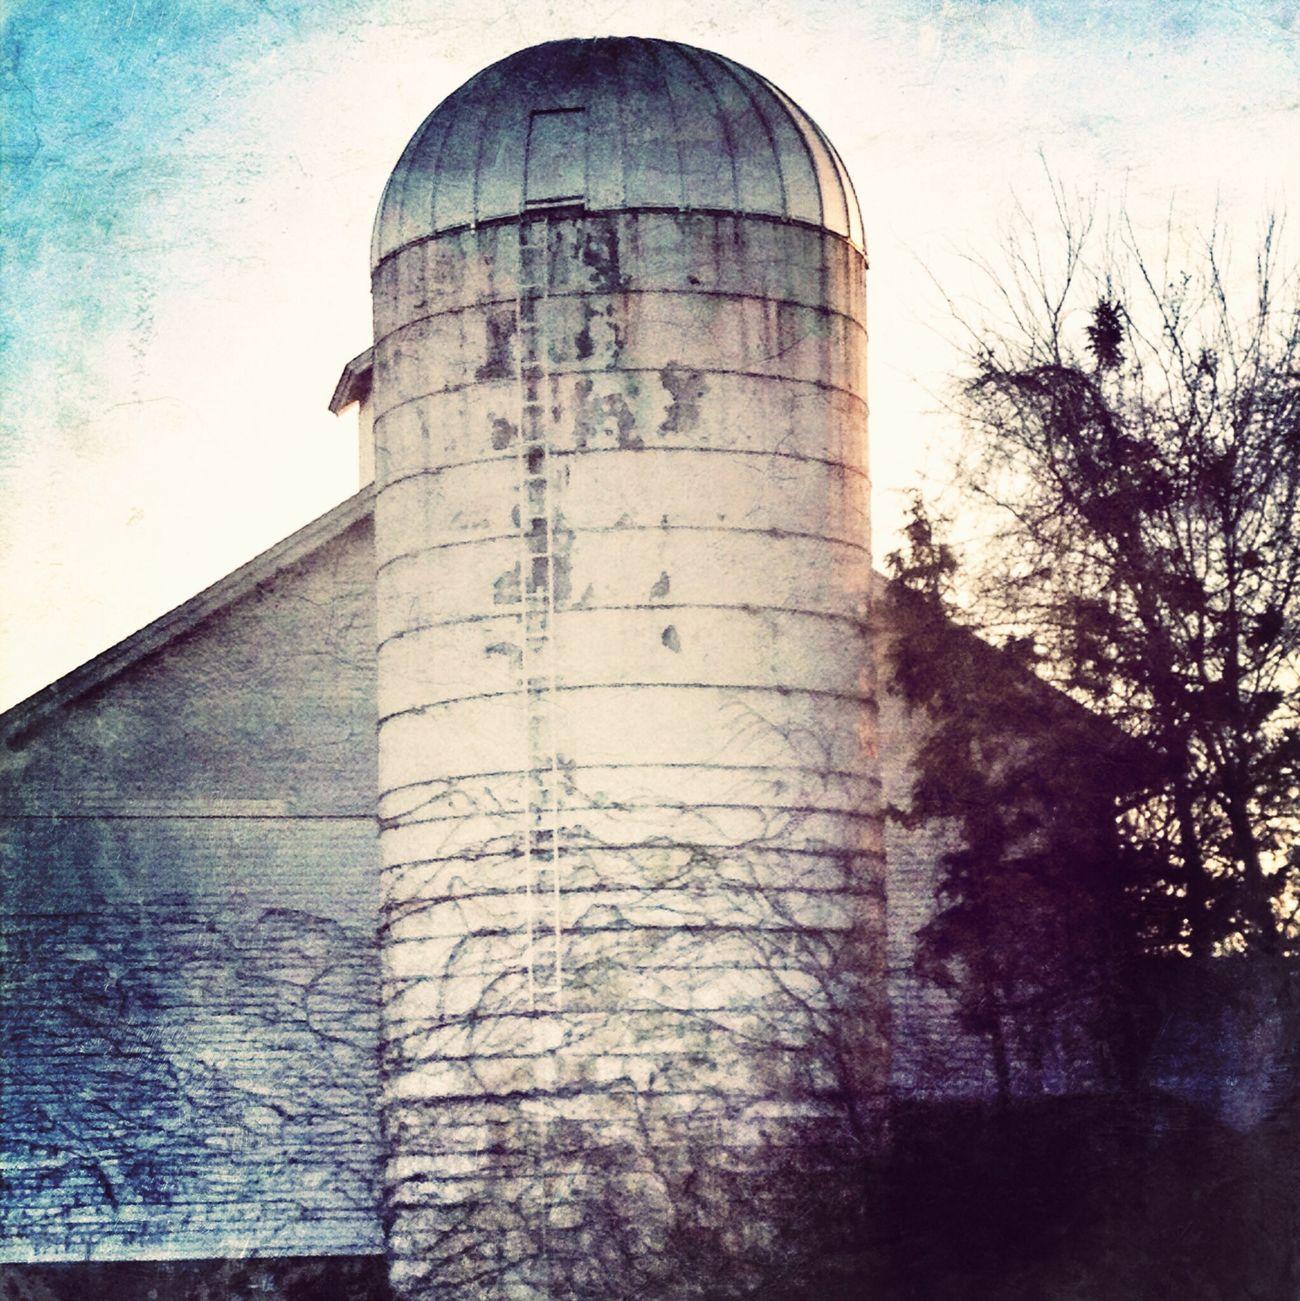 EyeEm Filter Food P Mexturesapp Barnsnipers RuralTreasures